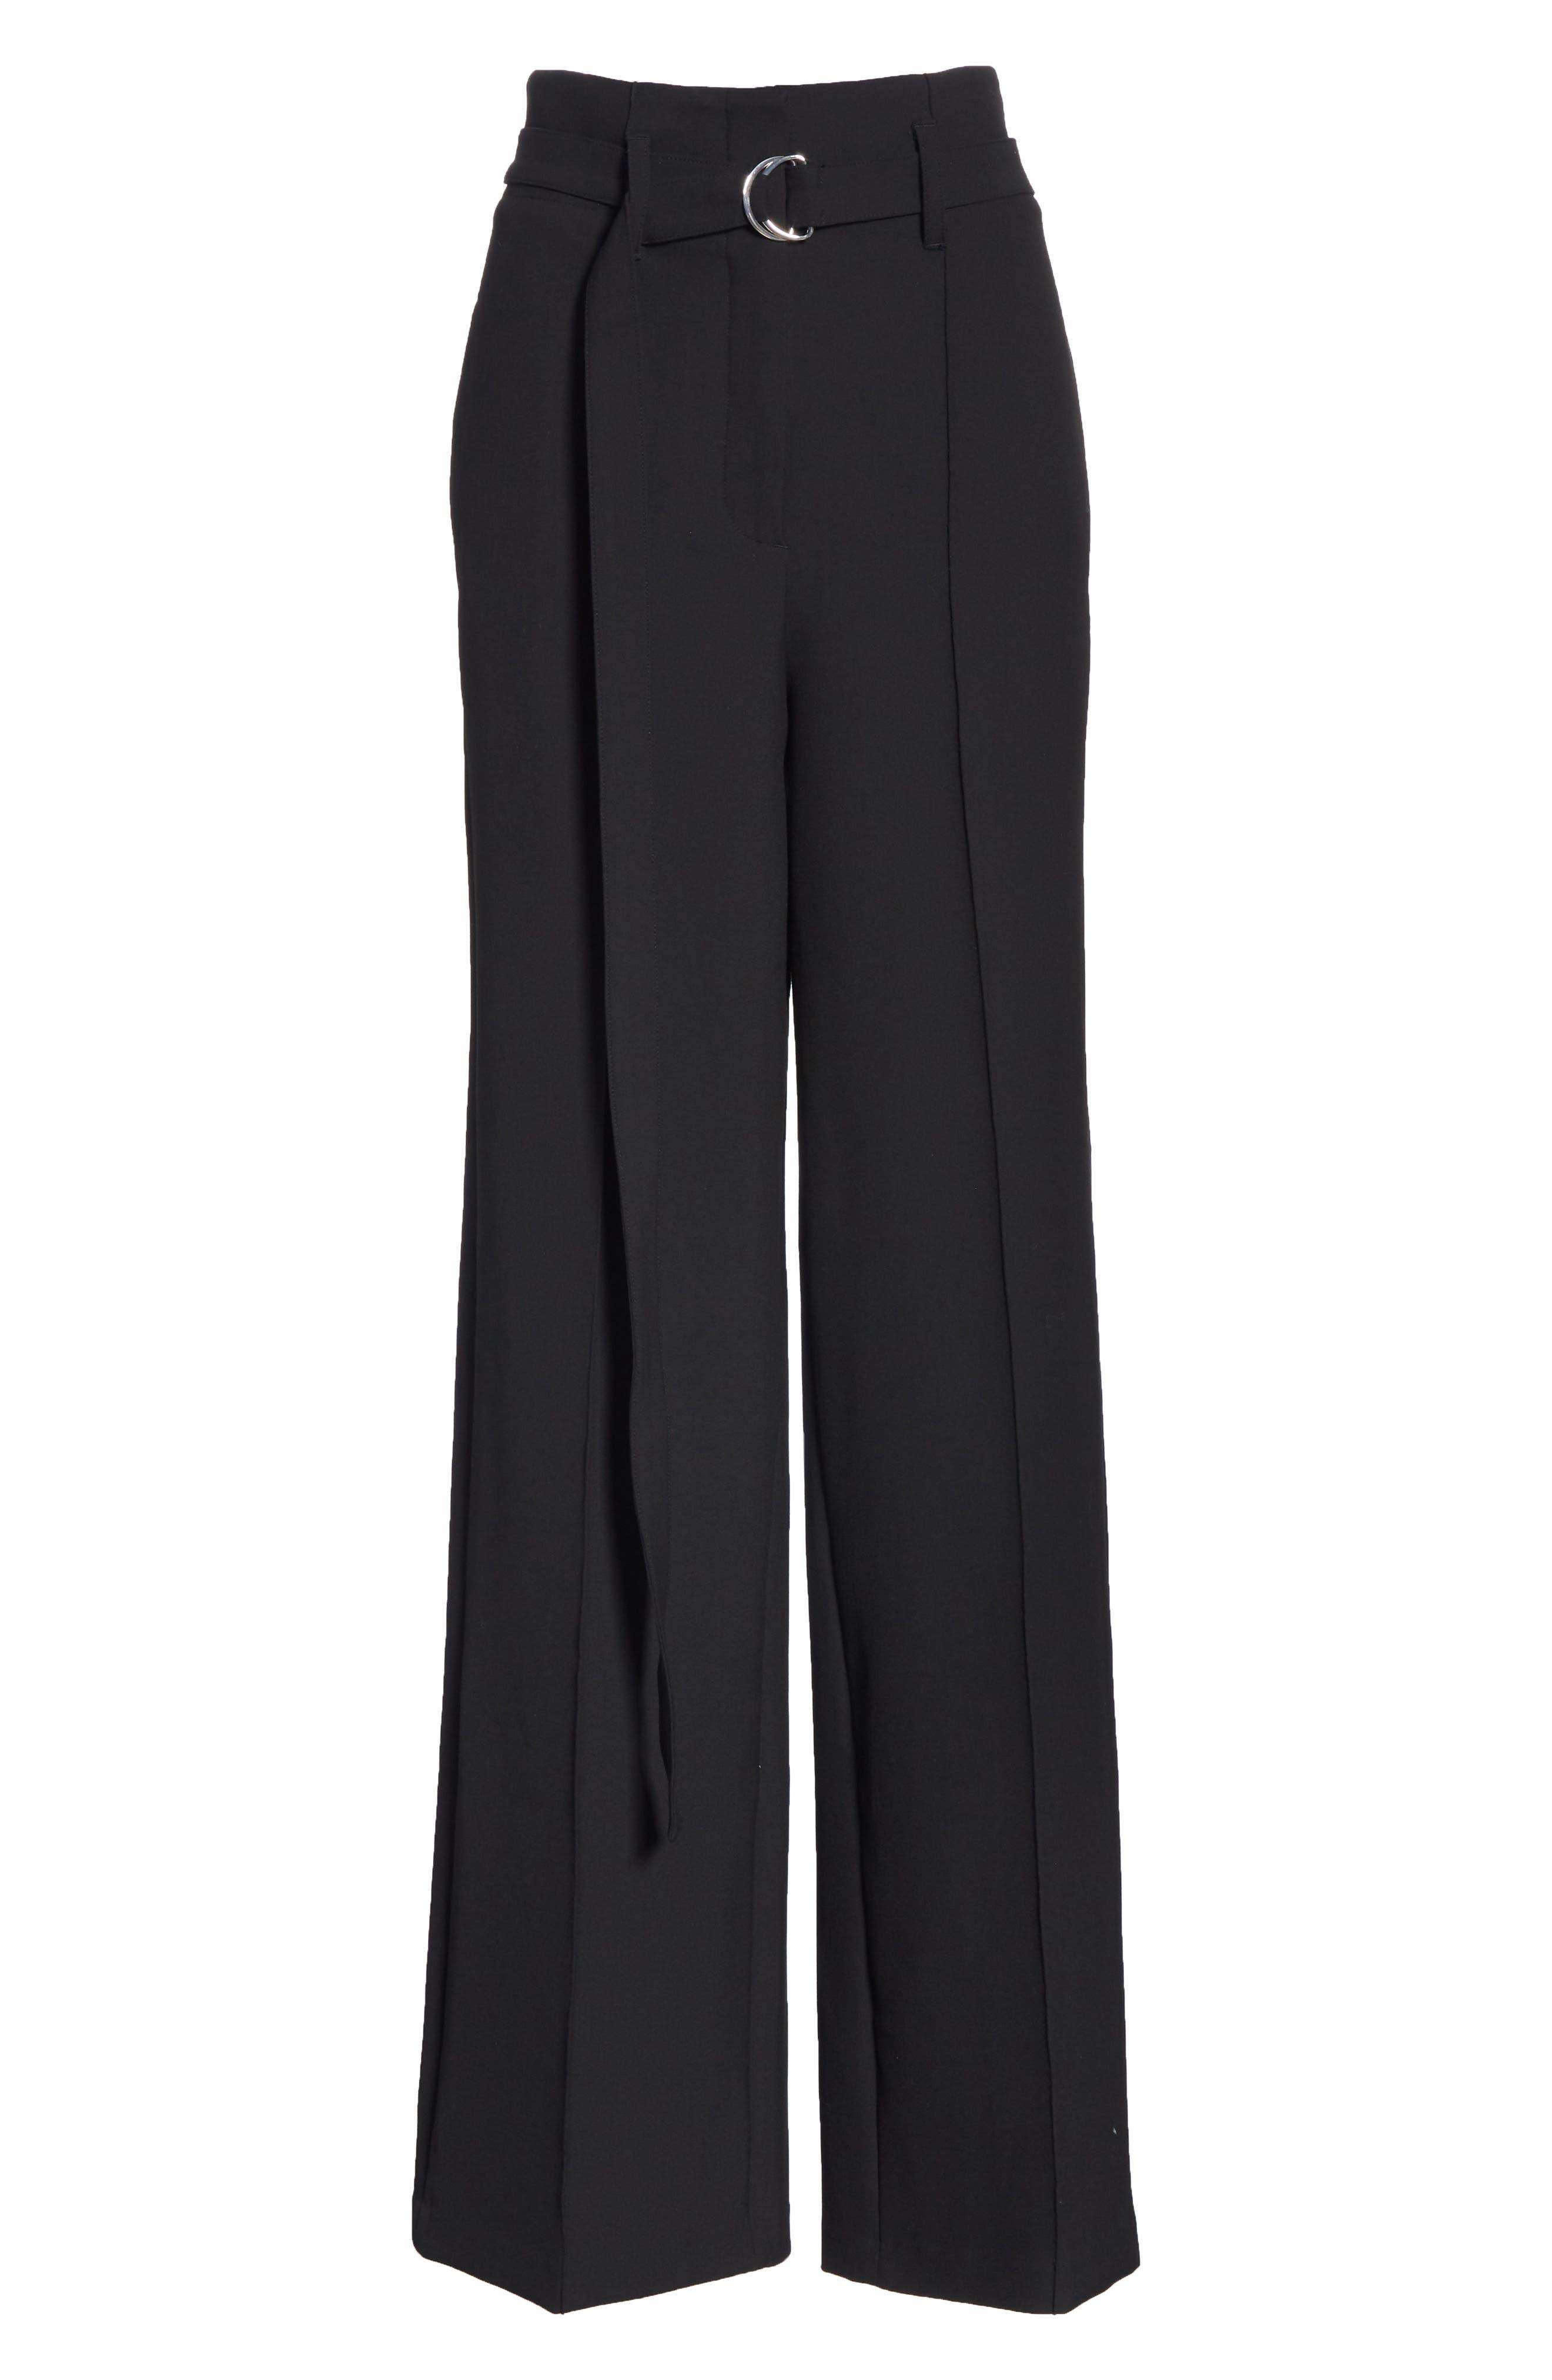 Belted Wide Leg Pants,                             Alternate thumbnail 6, color,                             BLACK